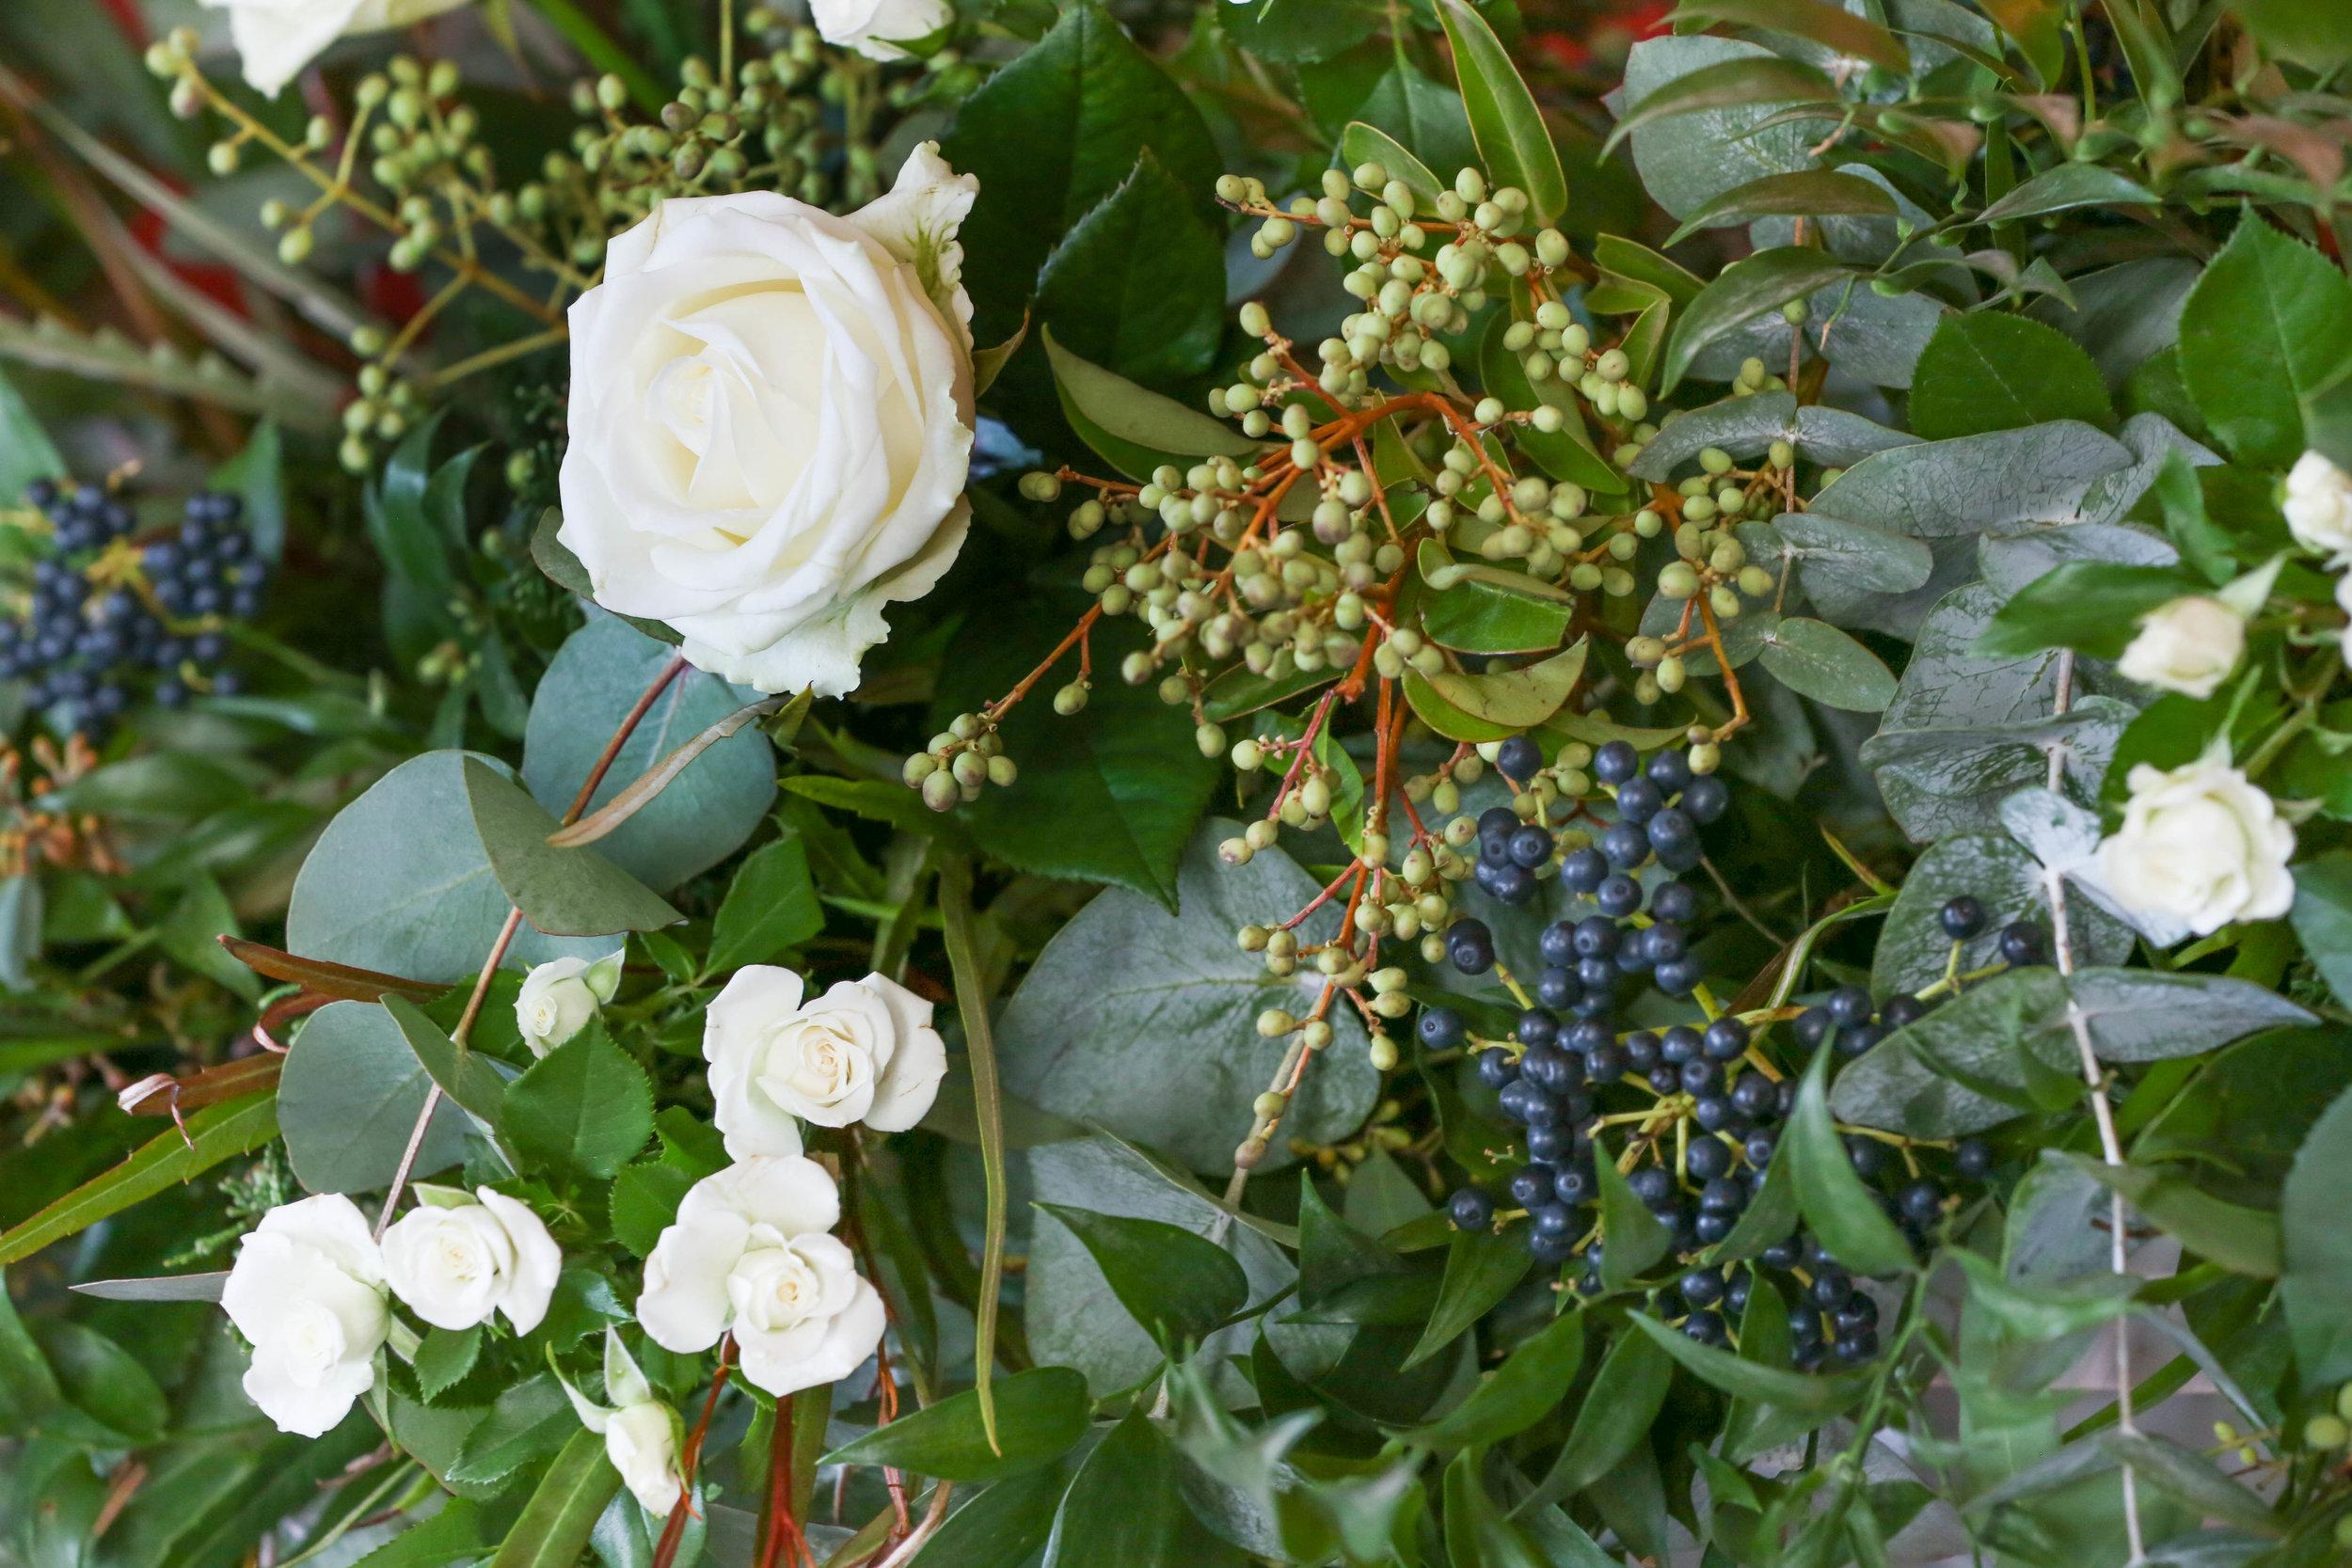 Winter foliage & berries